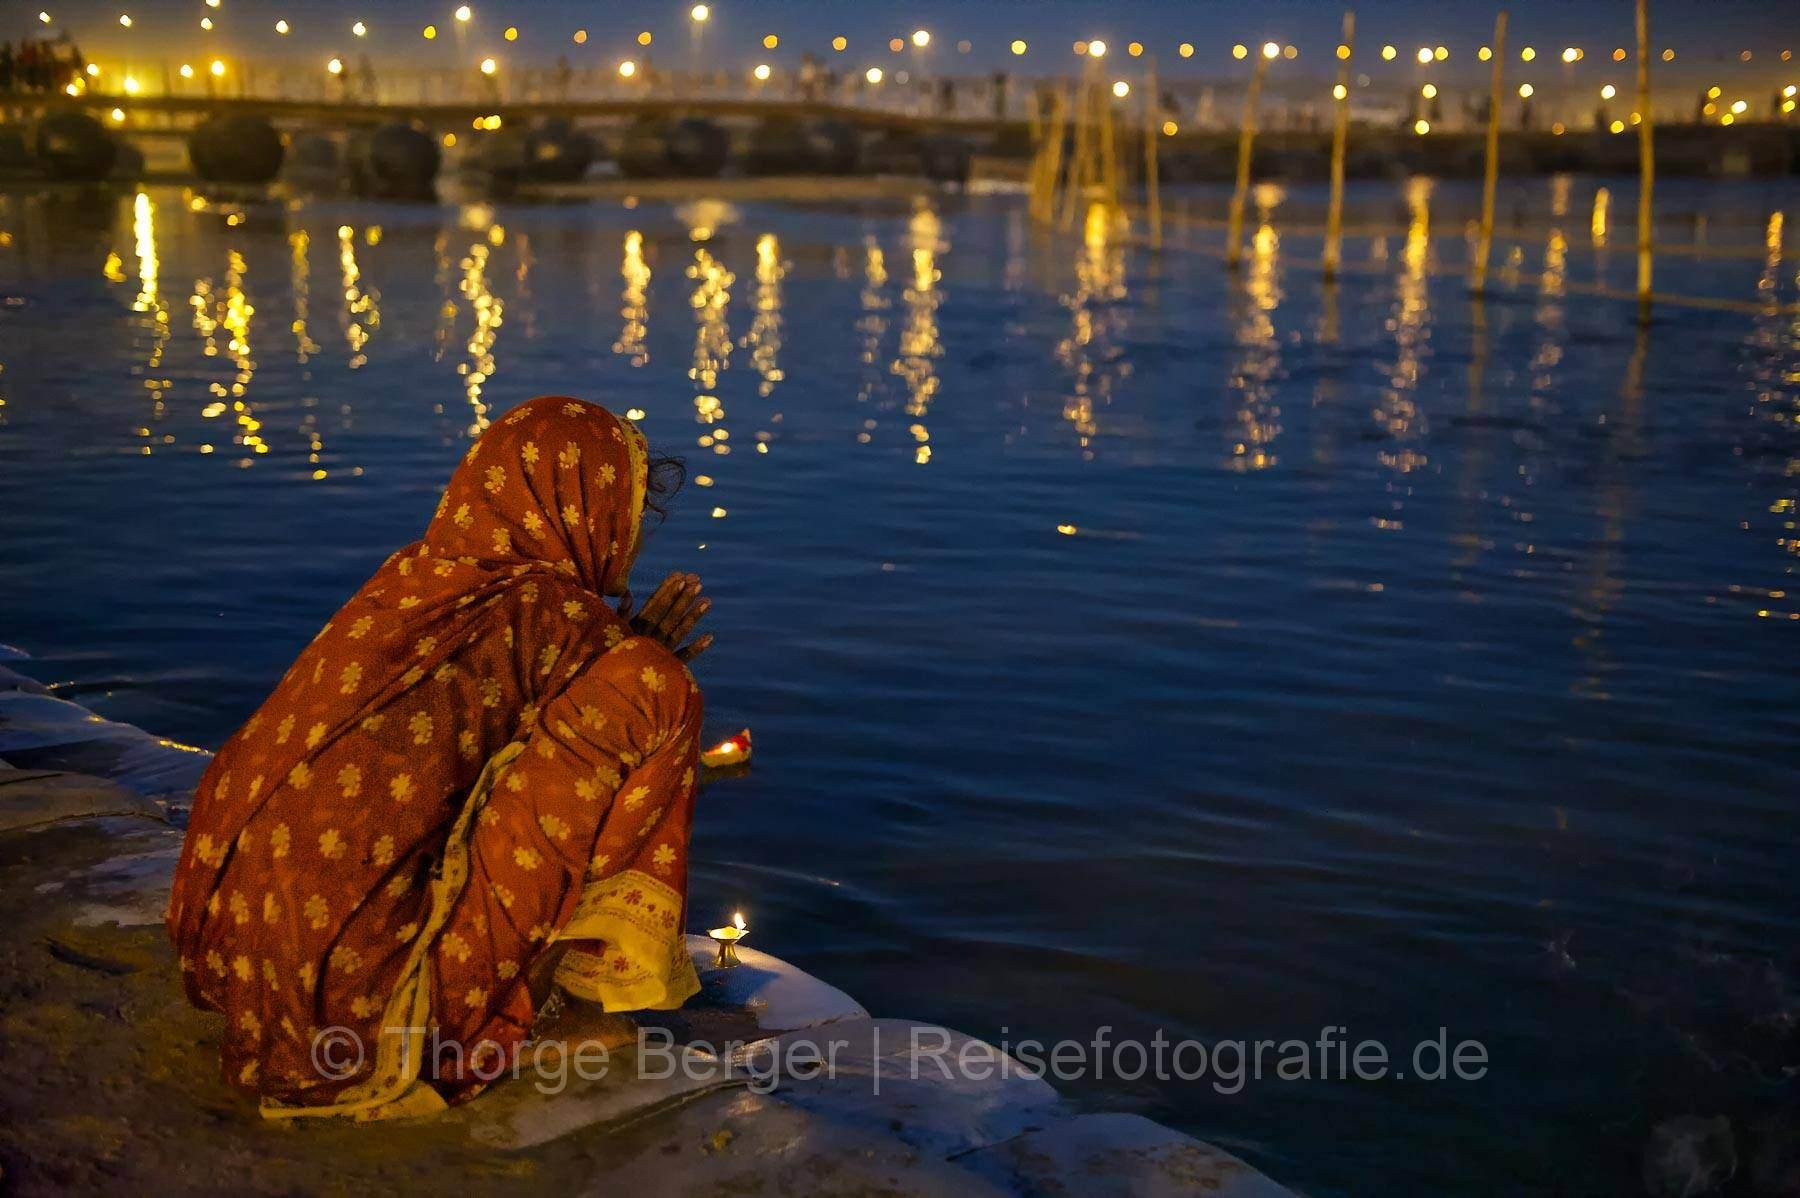 Betende Frau am Ganges auf der Kumbh Mela 2013 in Allahabad